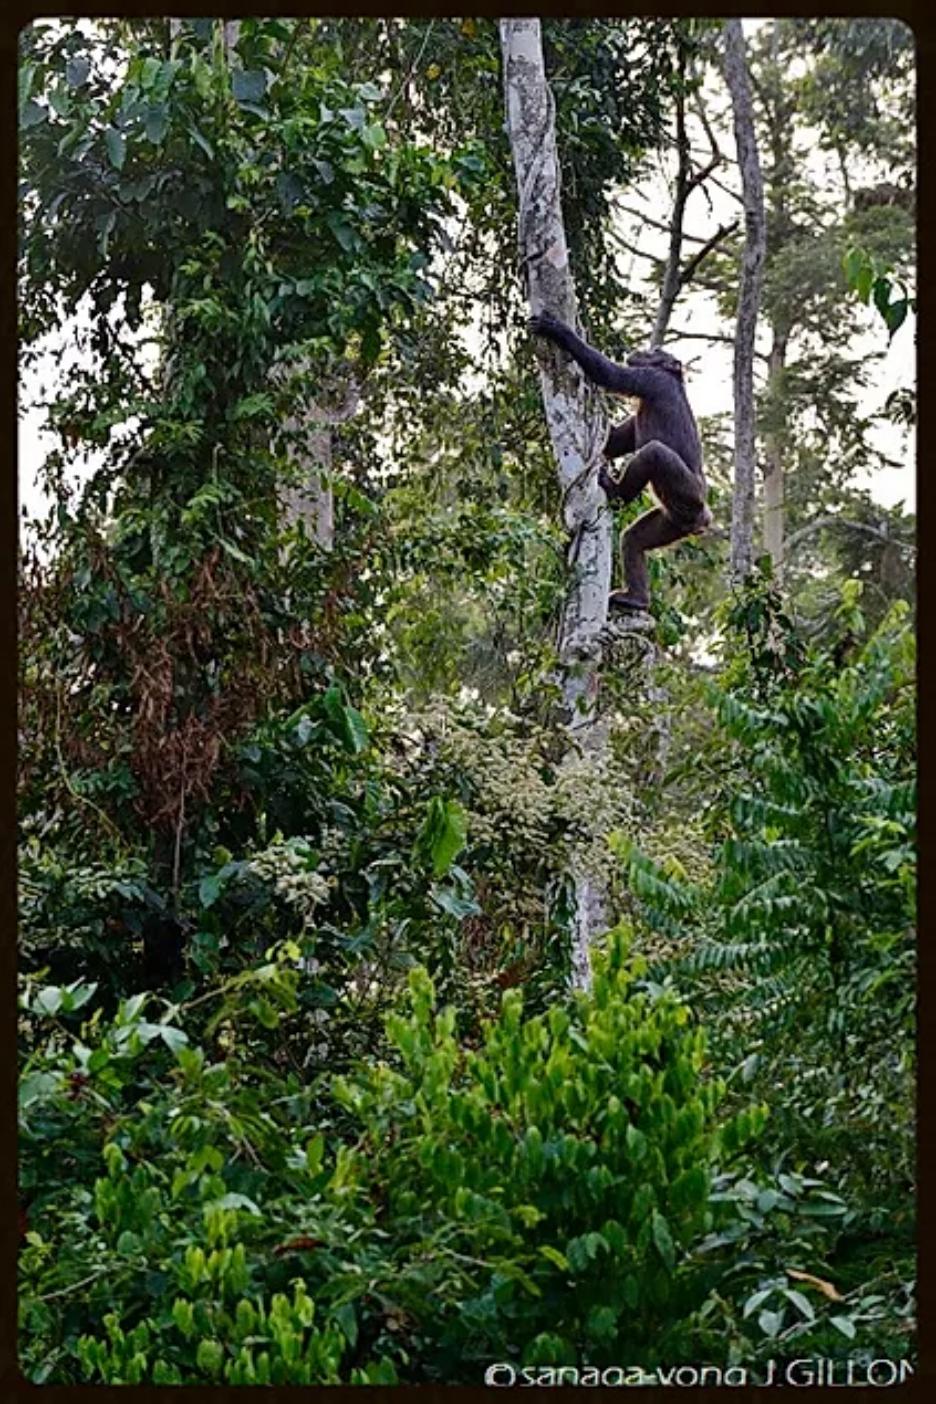 Chimp-nigeria-cameroon - Sekakoh